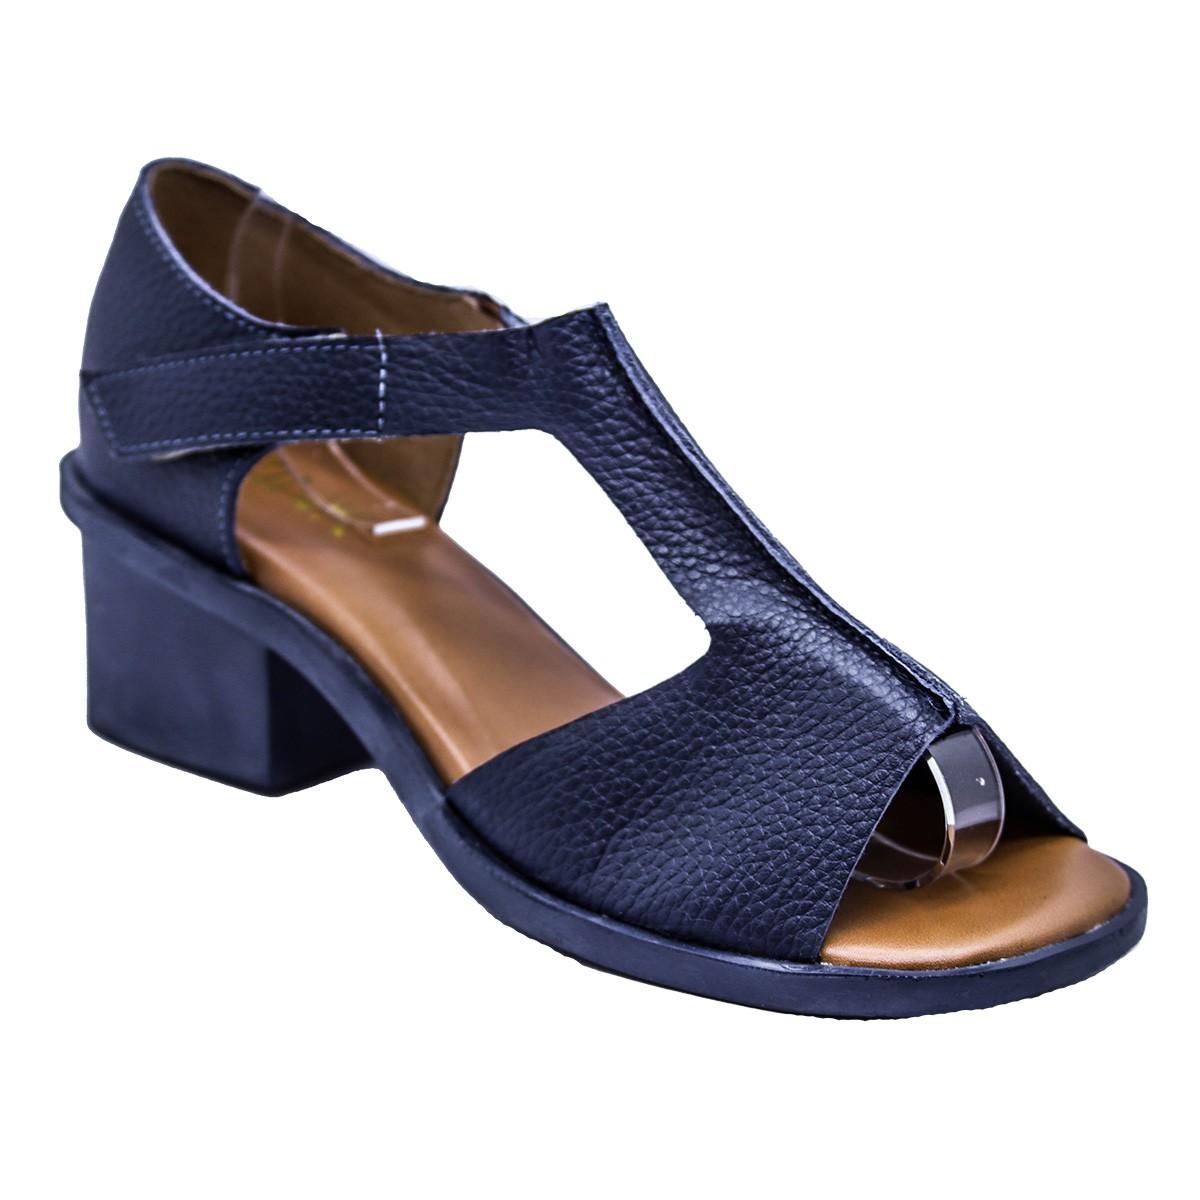 Sandália Nati Couro Azul Jeans 4 cm